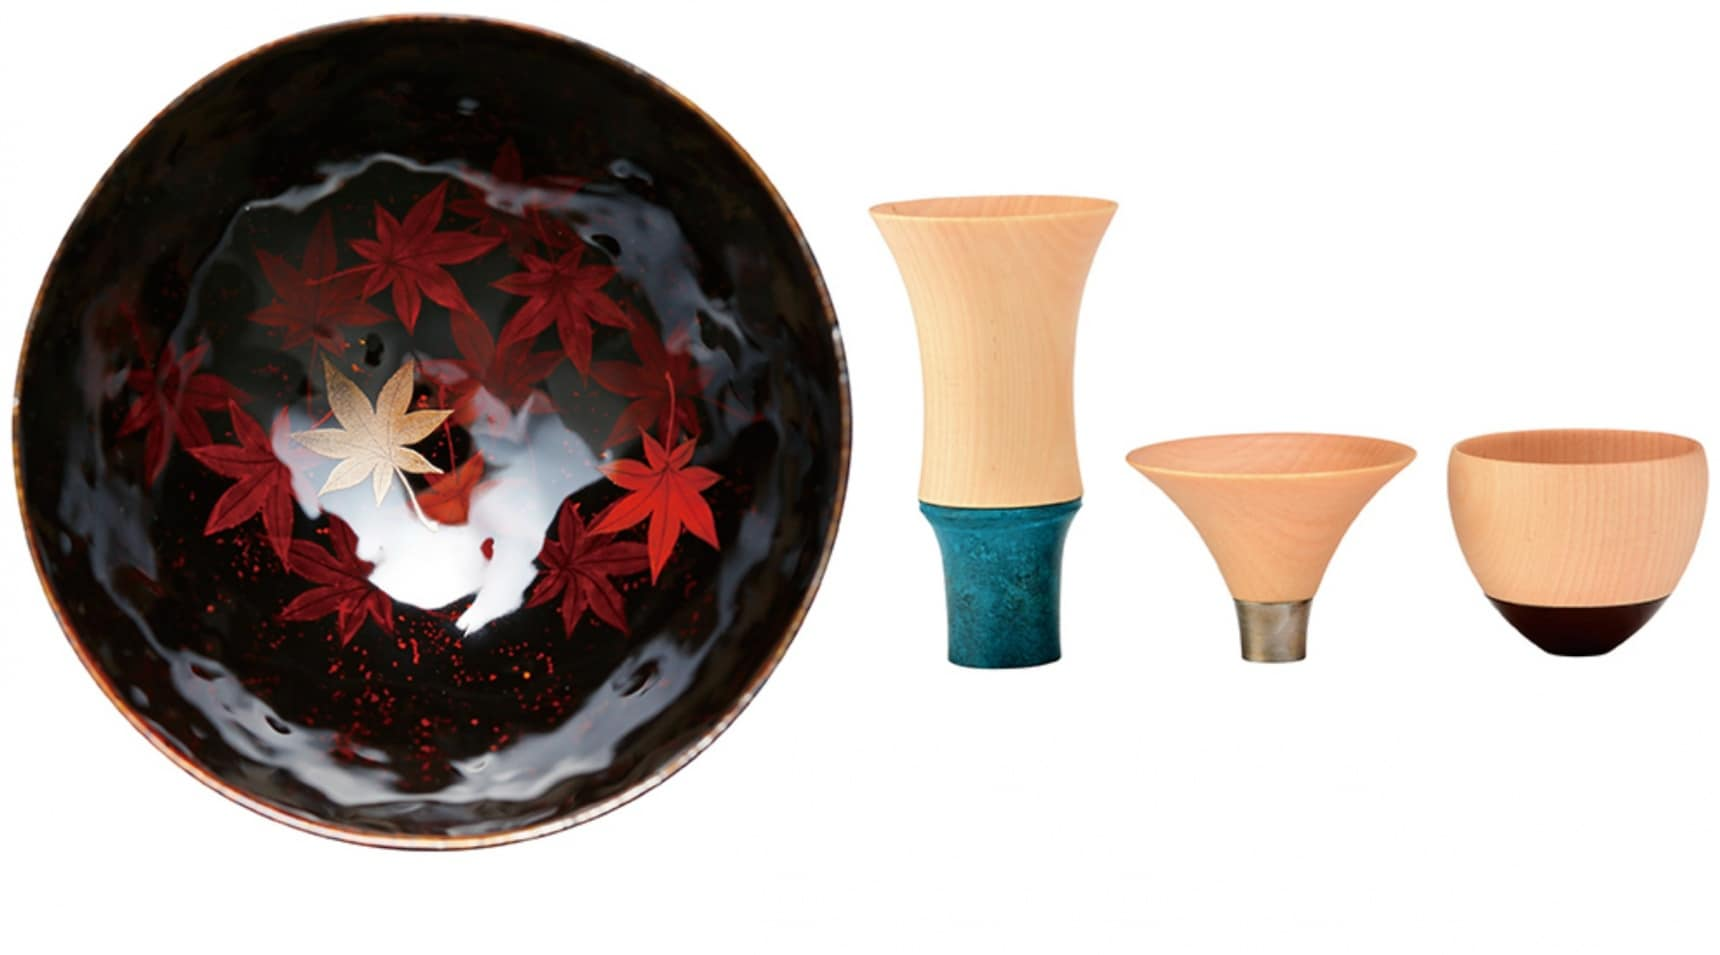 5 Distinctive Sake Cups